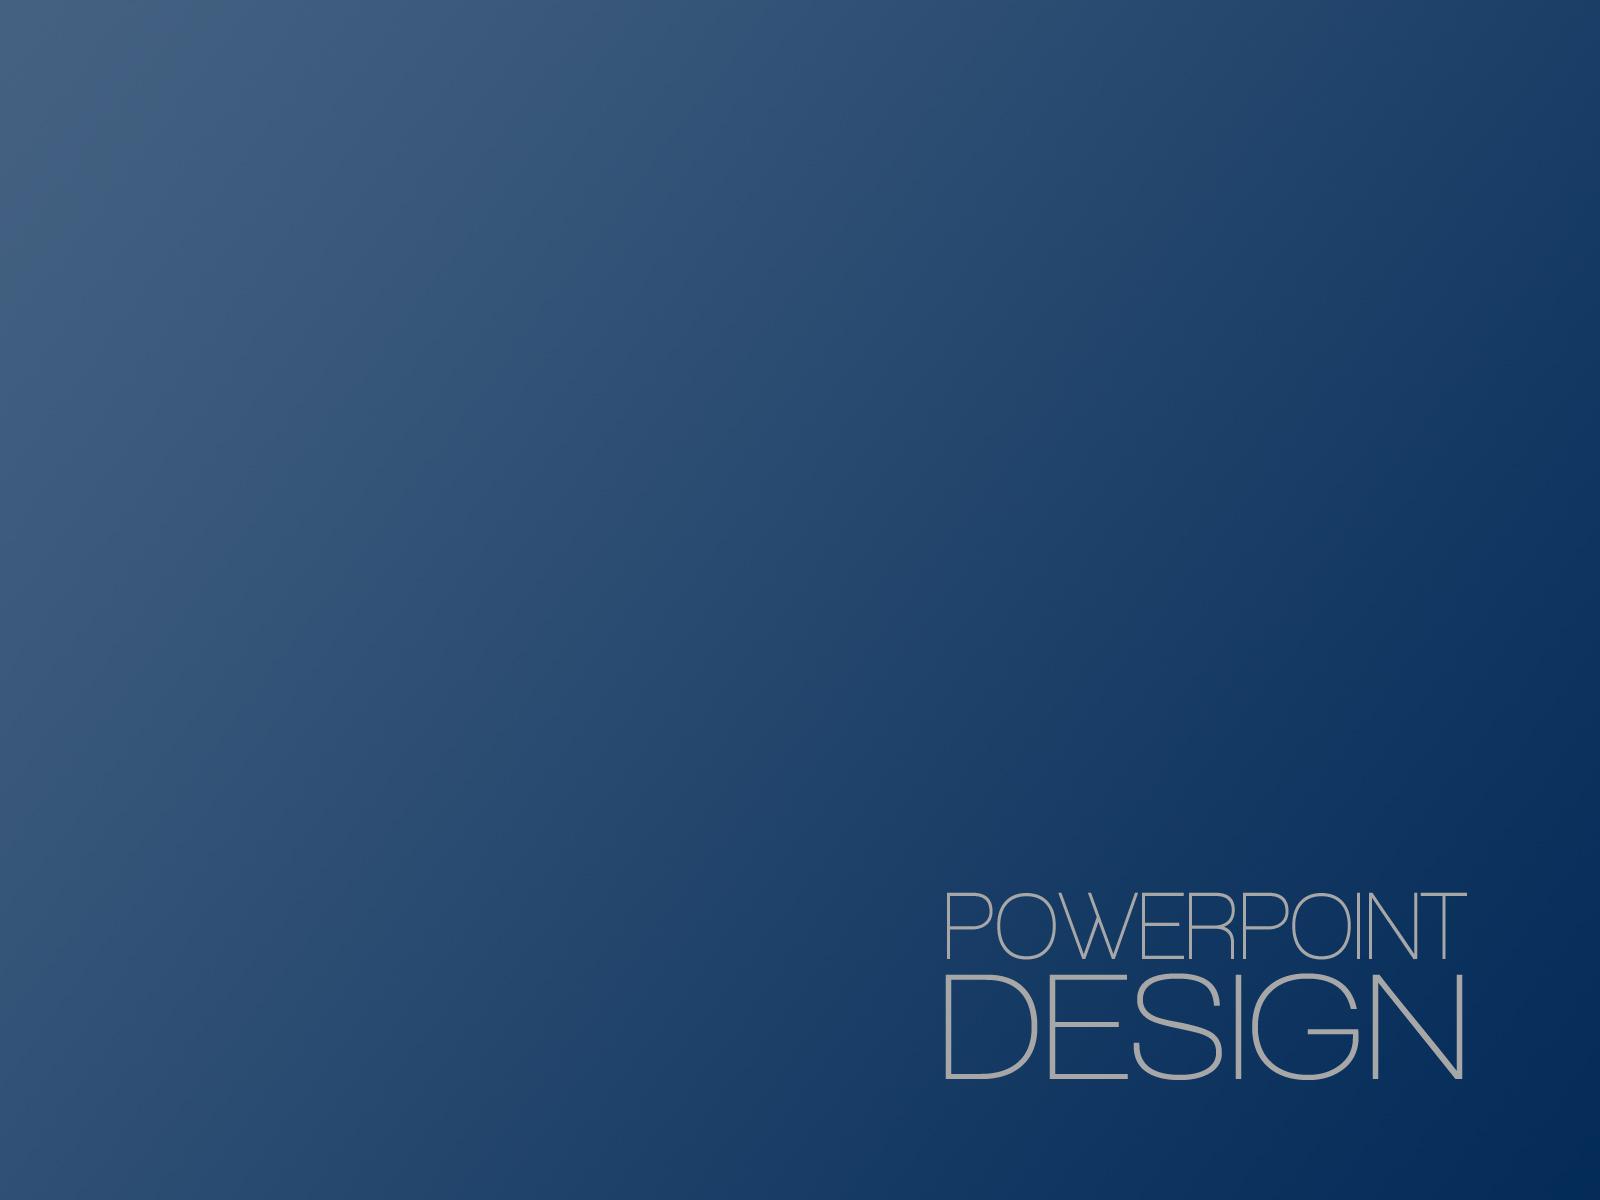 PowerPoint Design – 1 -Title